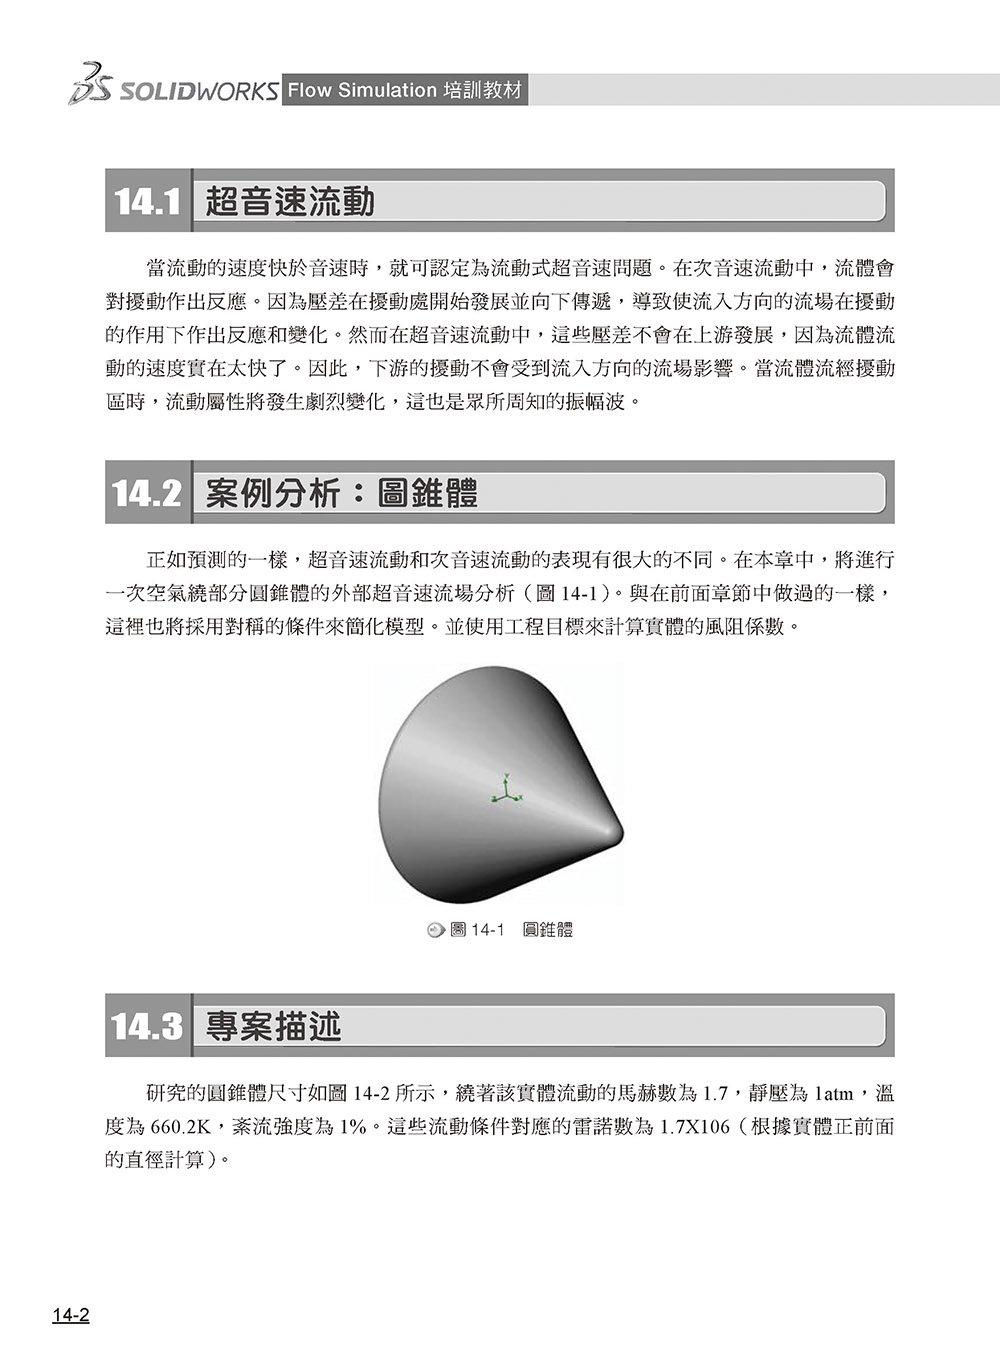 SOLIDWORKS Flow Simulation 培訓教材<繁體中文版>-preview-1